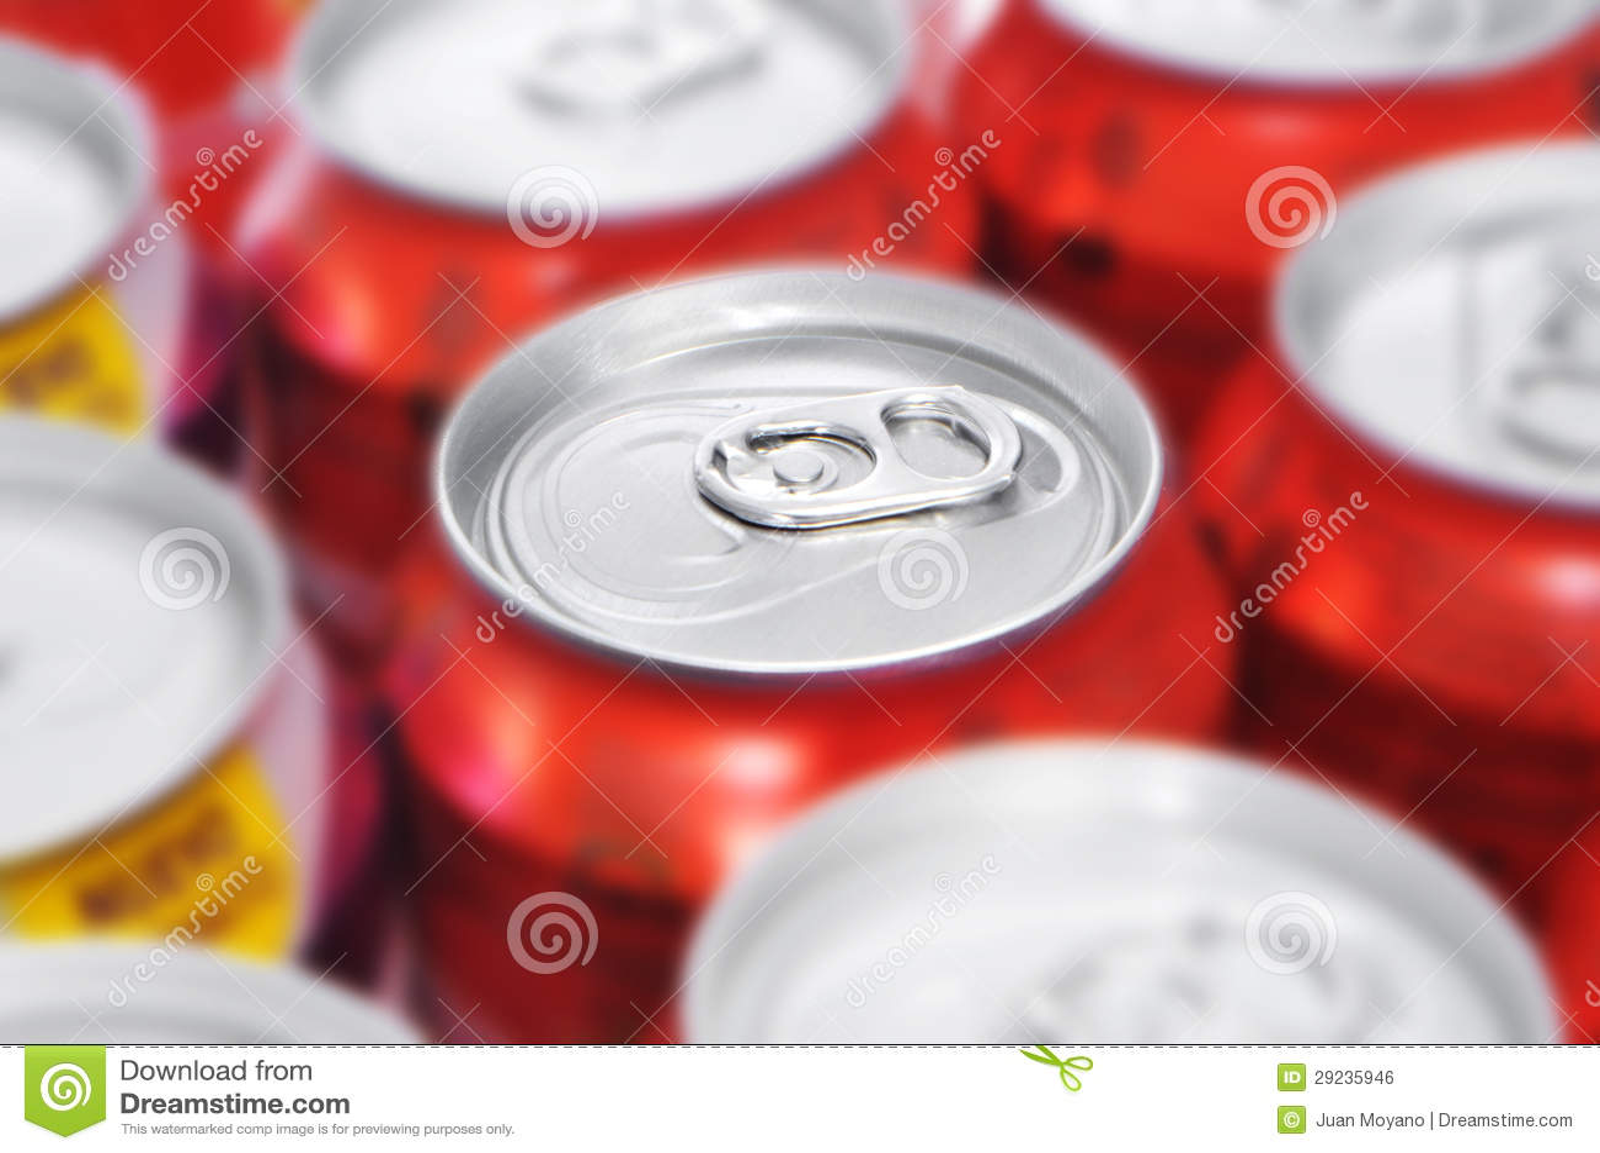 Download Latas de soda foto de stock. Imagem de horizontal, projeto - 29235946